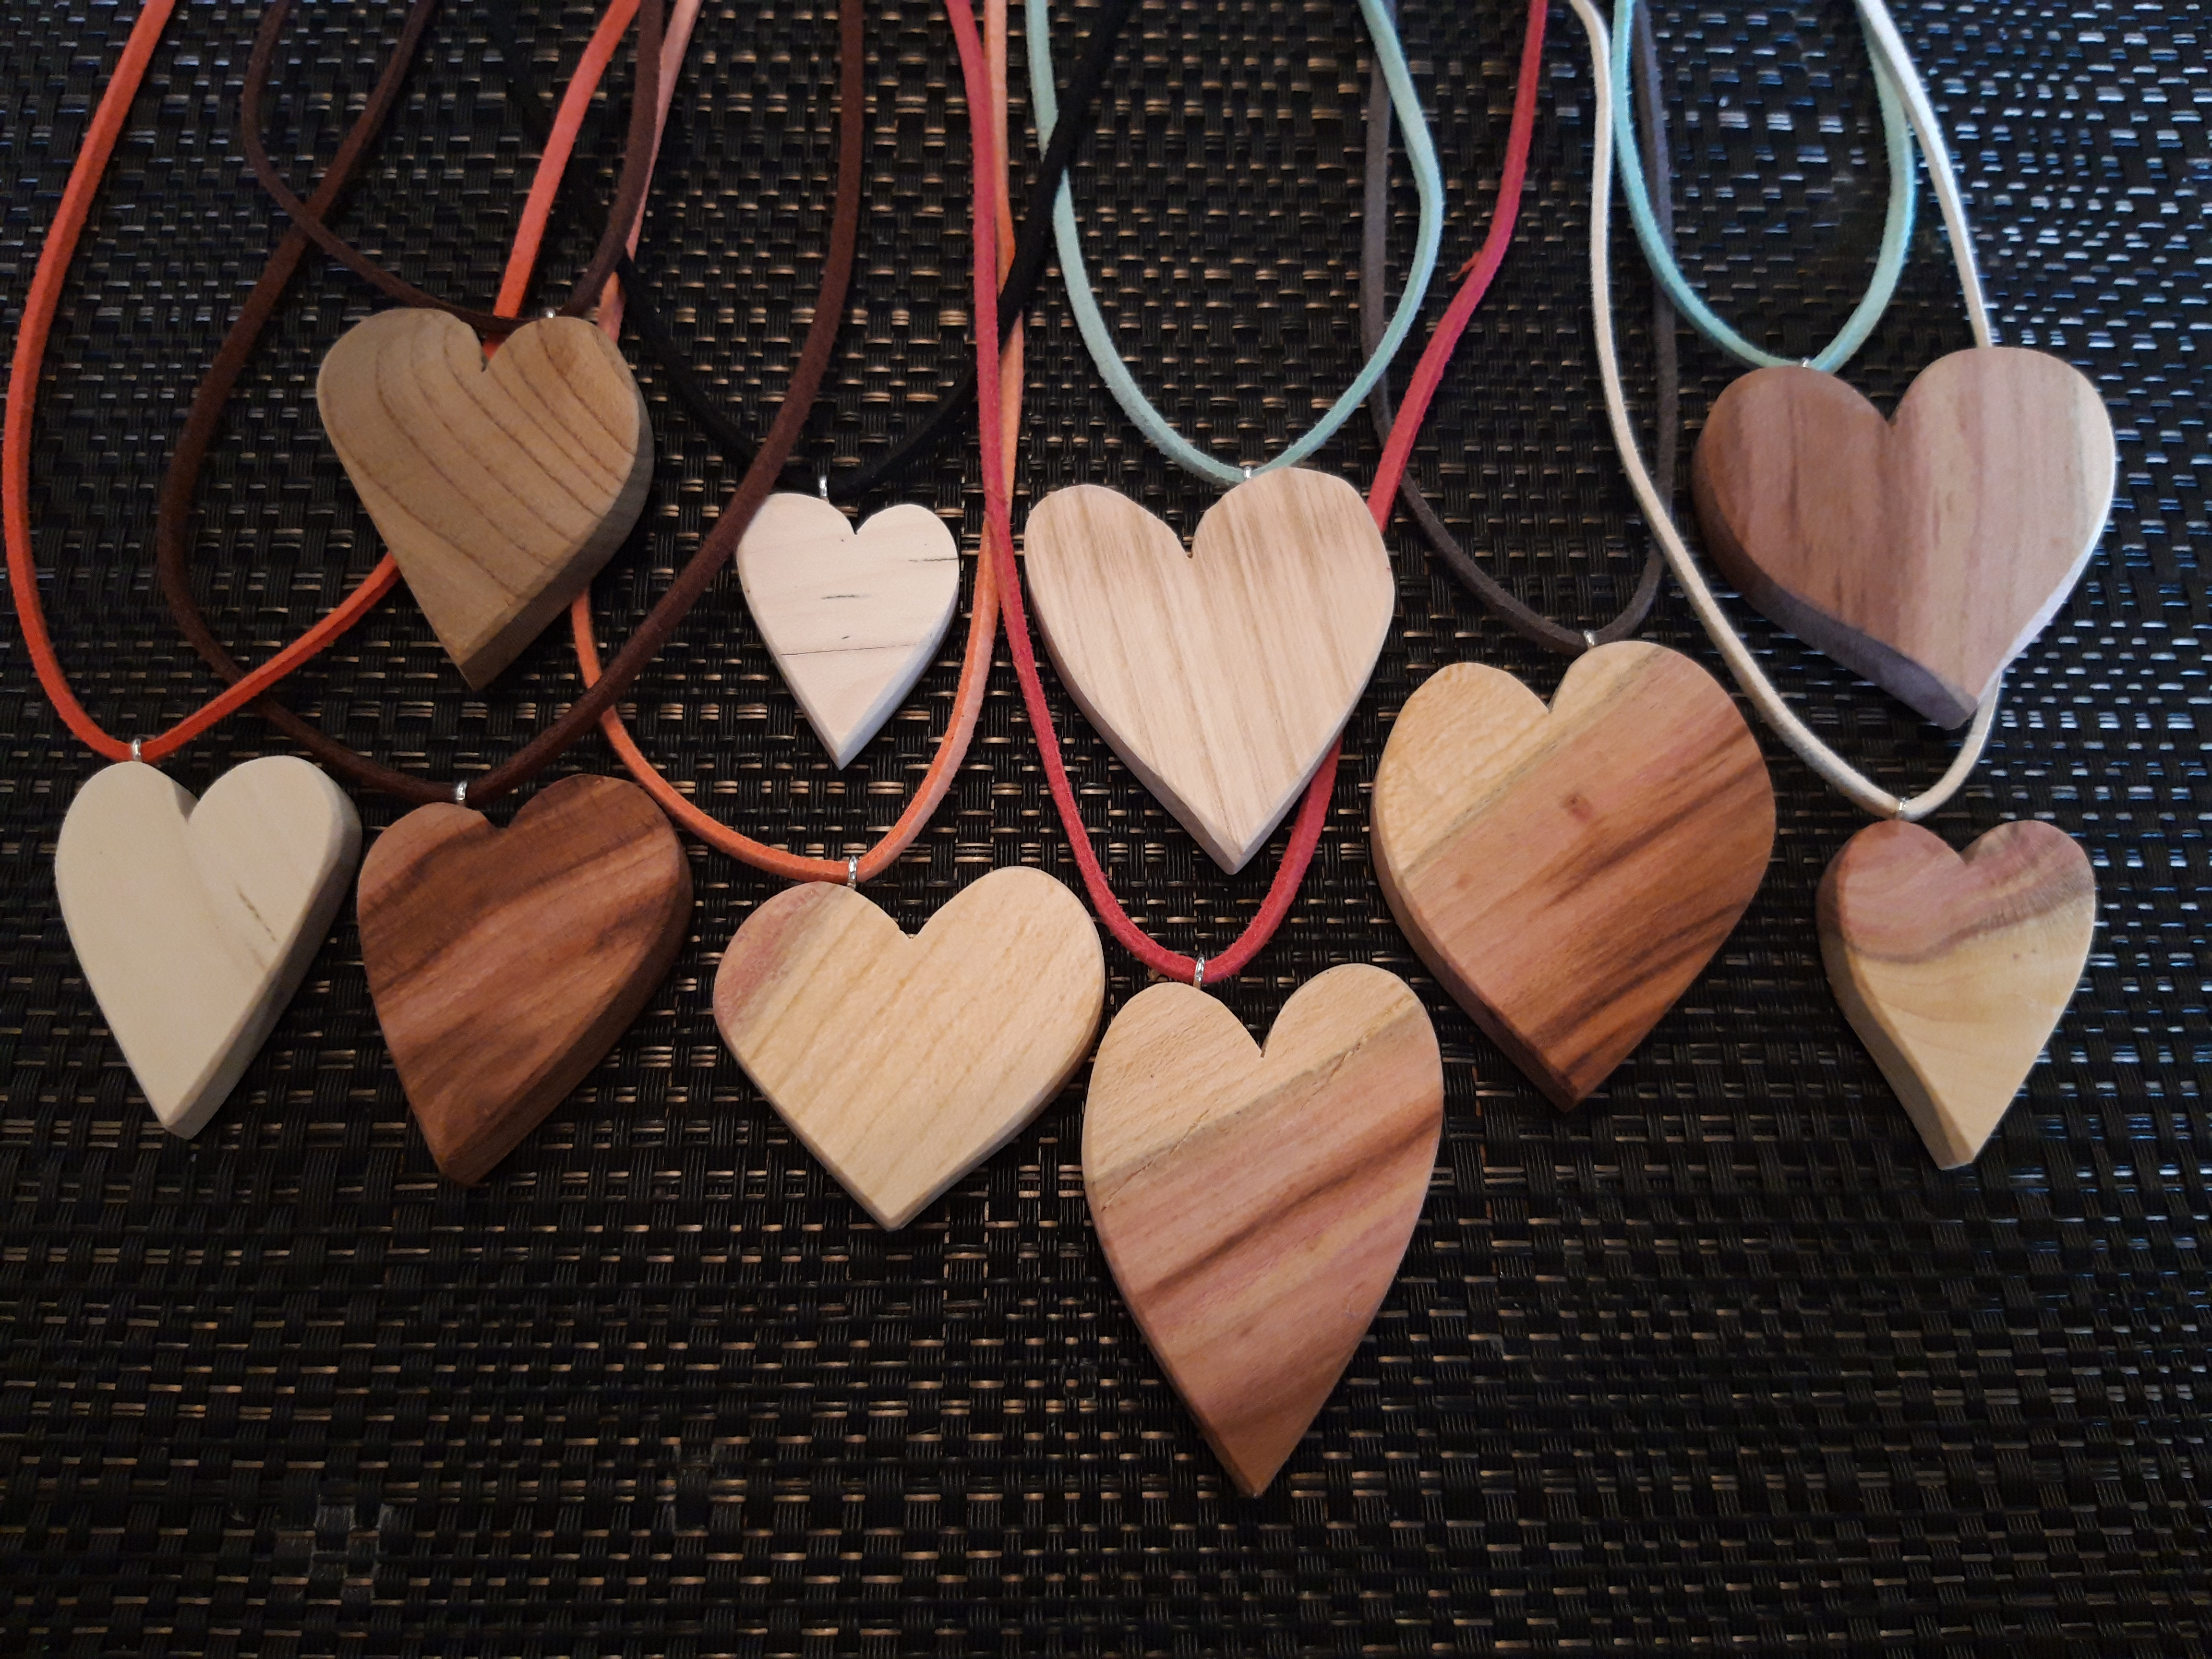 drevené šperky demo